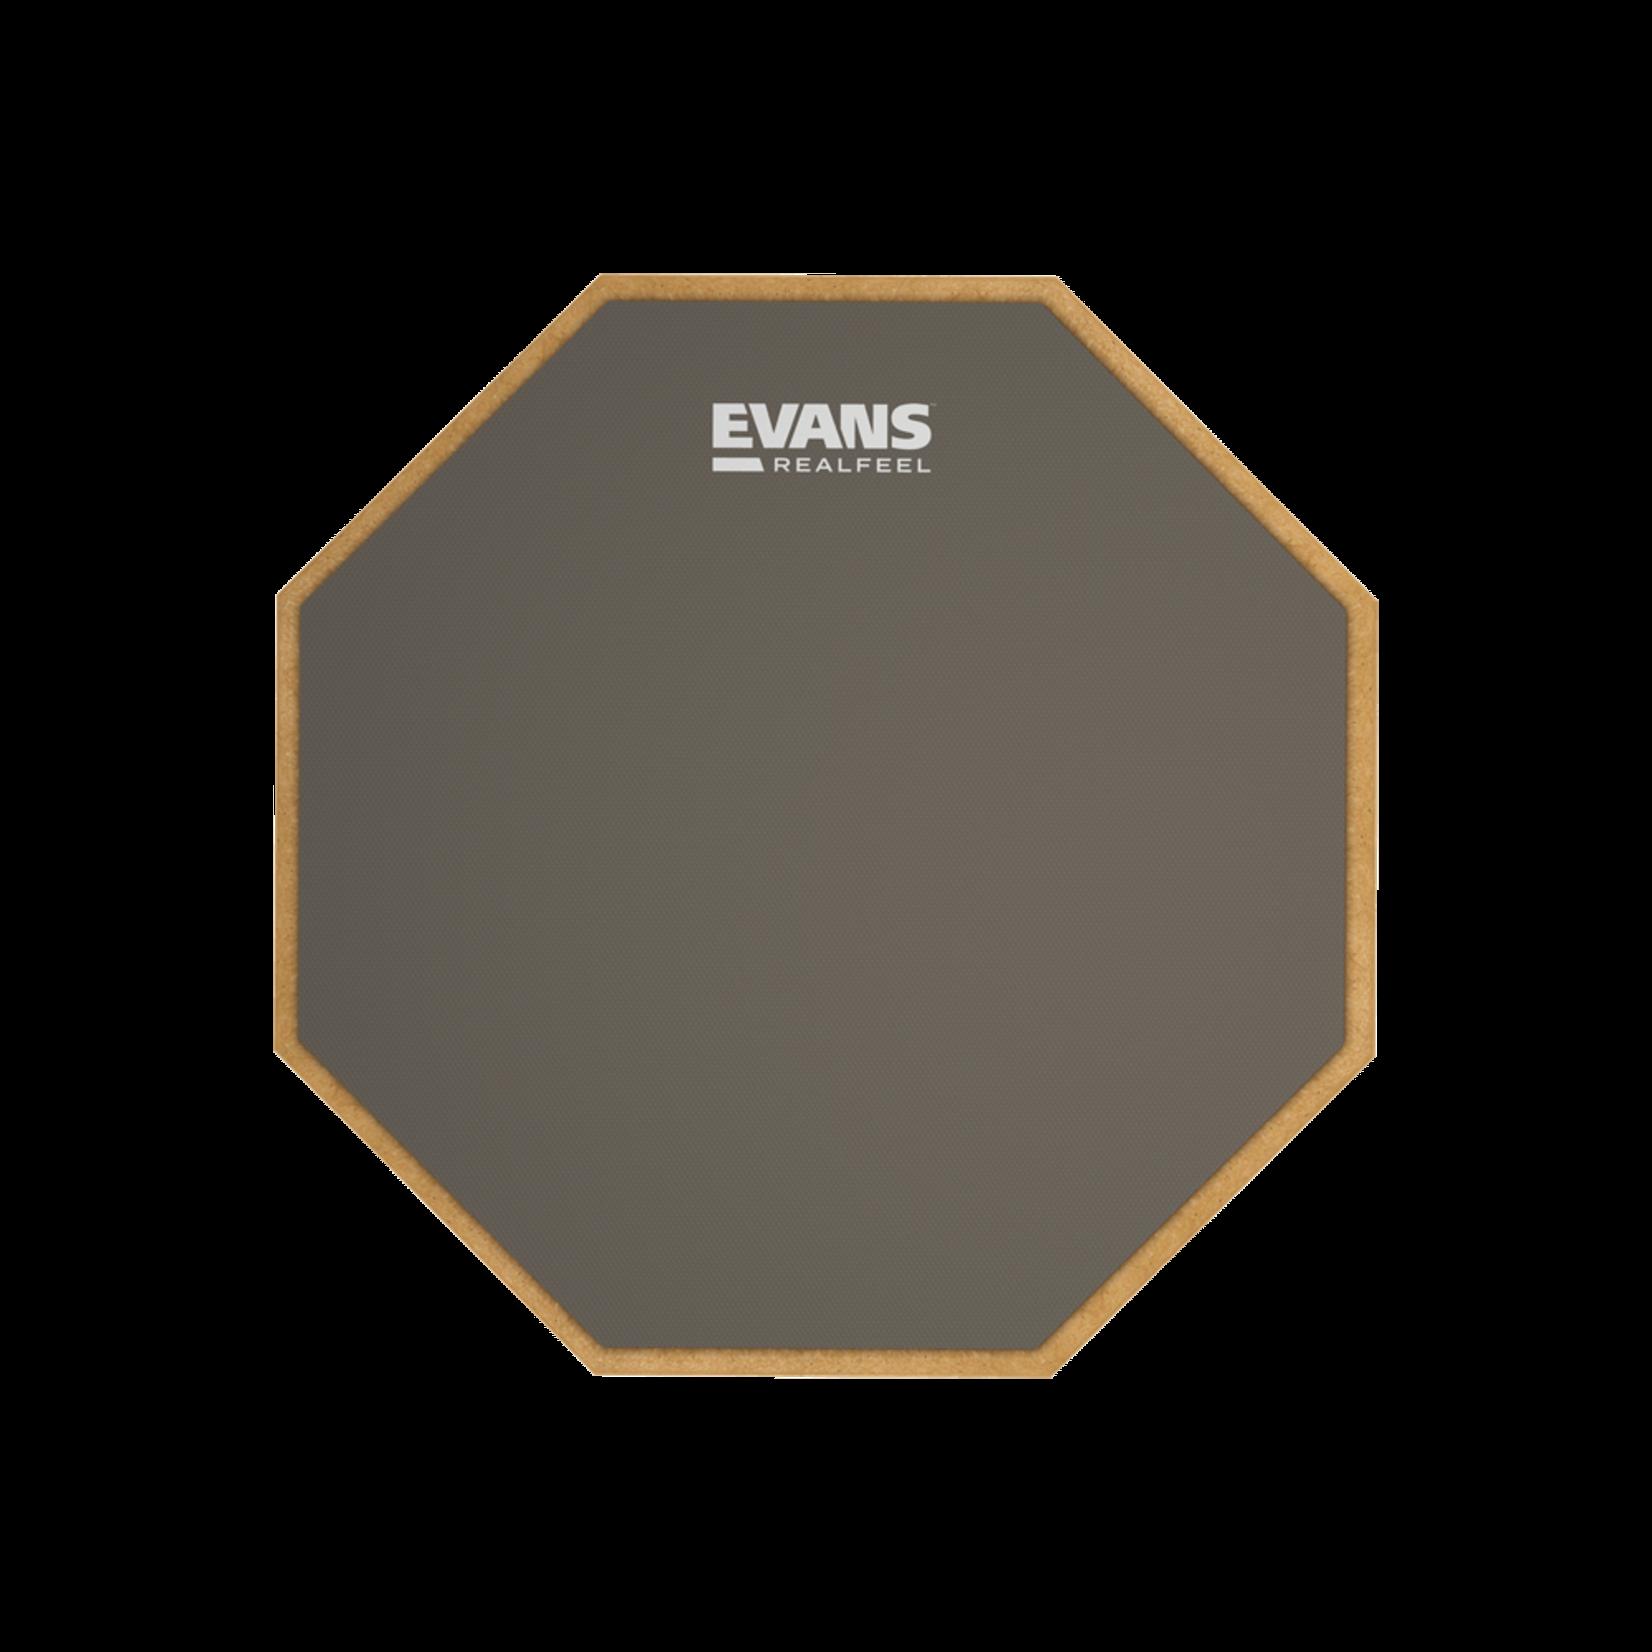 "EVANS RF 12"" 1-SIDED STANDARD PAD"